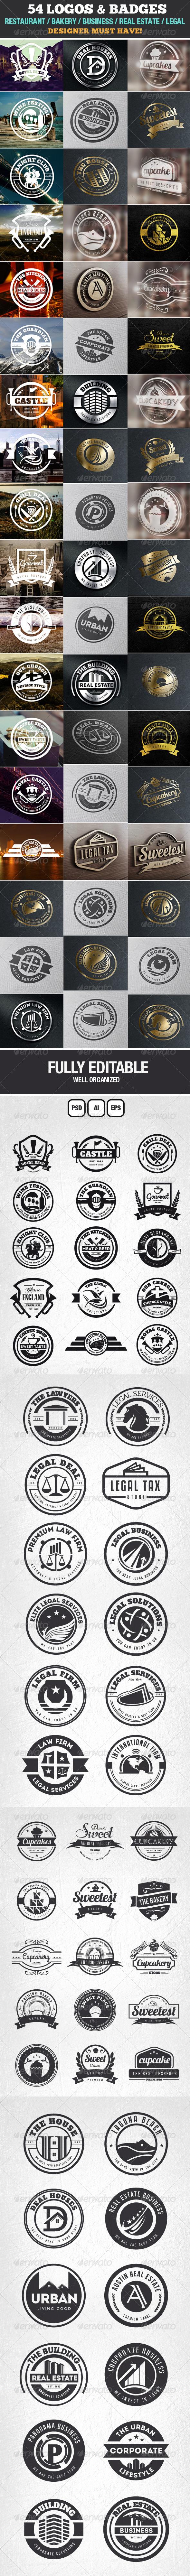 GraphicRiver 54 Logo Templates Badge Insignia Bundle 7067422